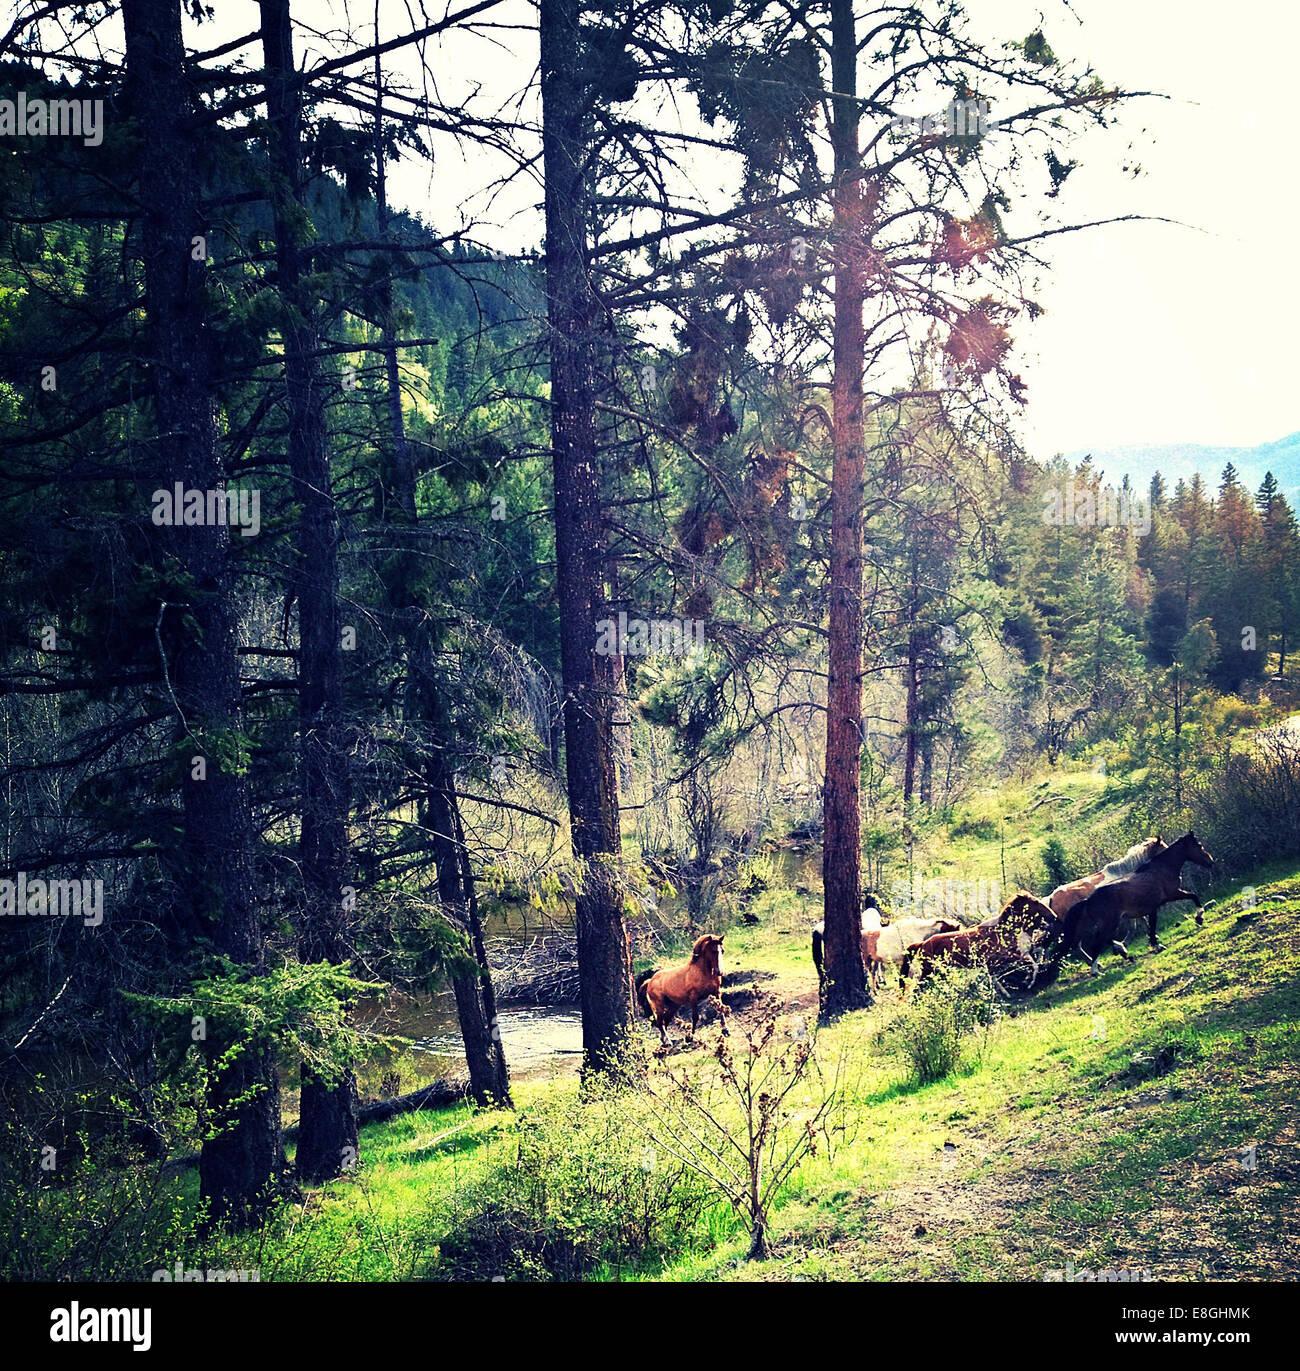 Canada, British Columbia, Okanogan Wild Horses - Stock Image